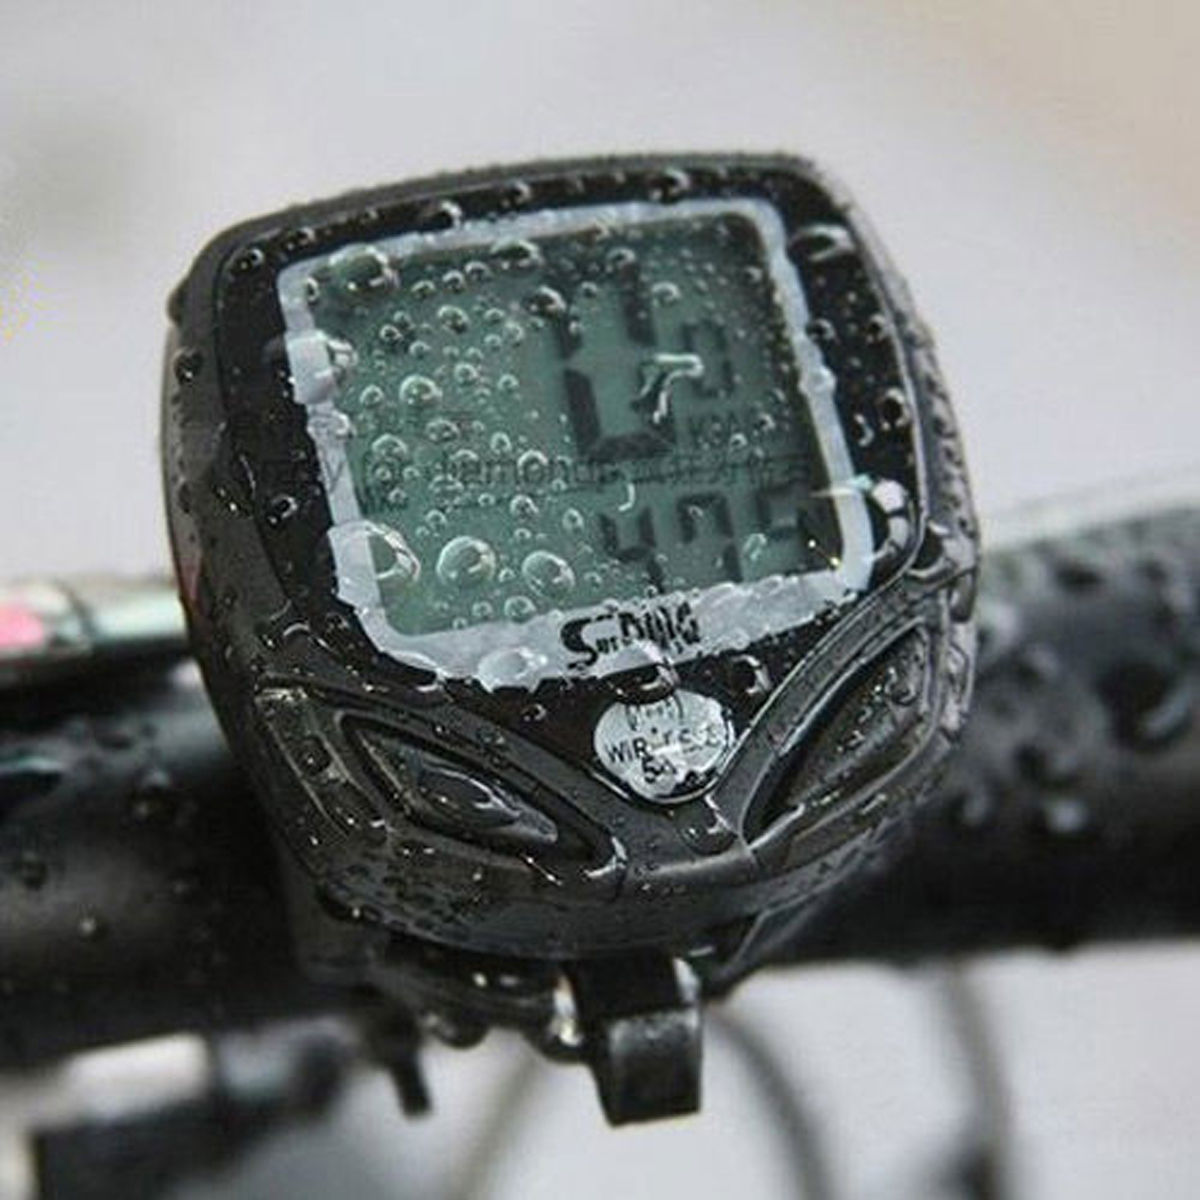 Wireless Waterproof Bike Bicycle Computer LCD Odometer Speedometer Stopwatch